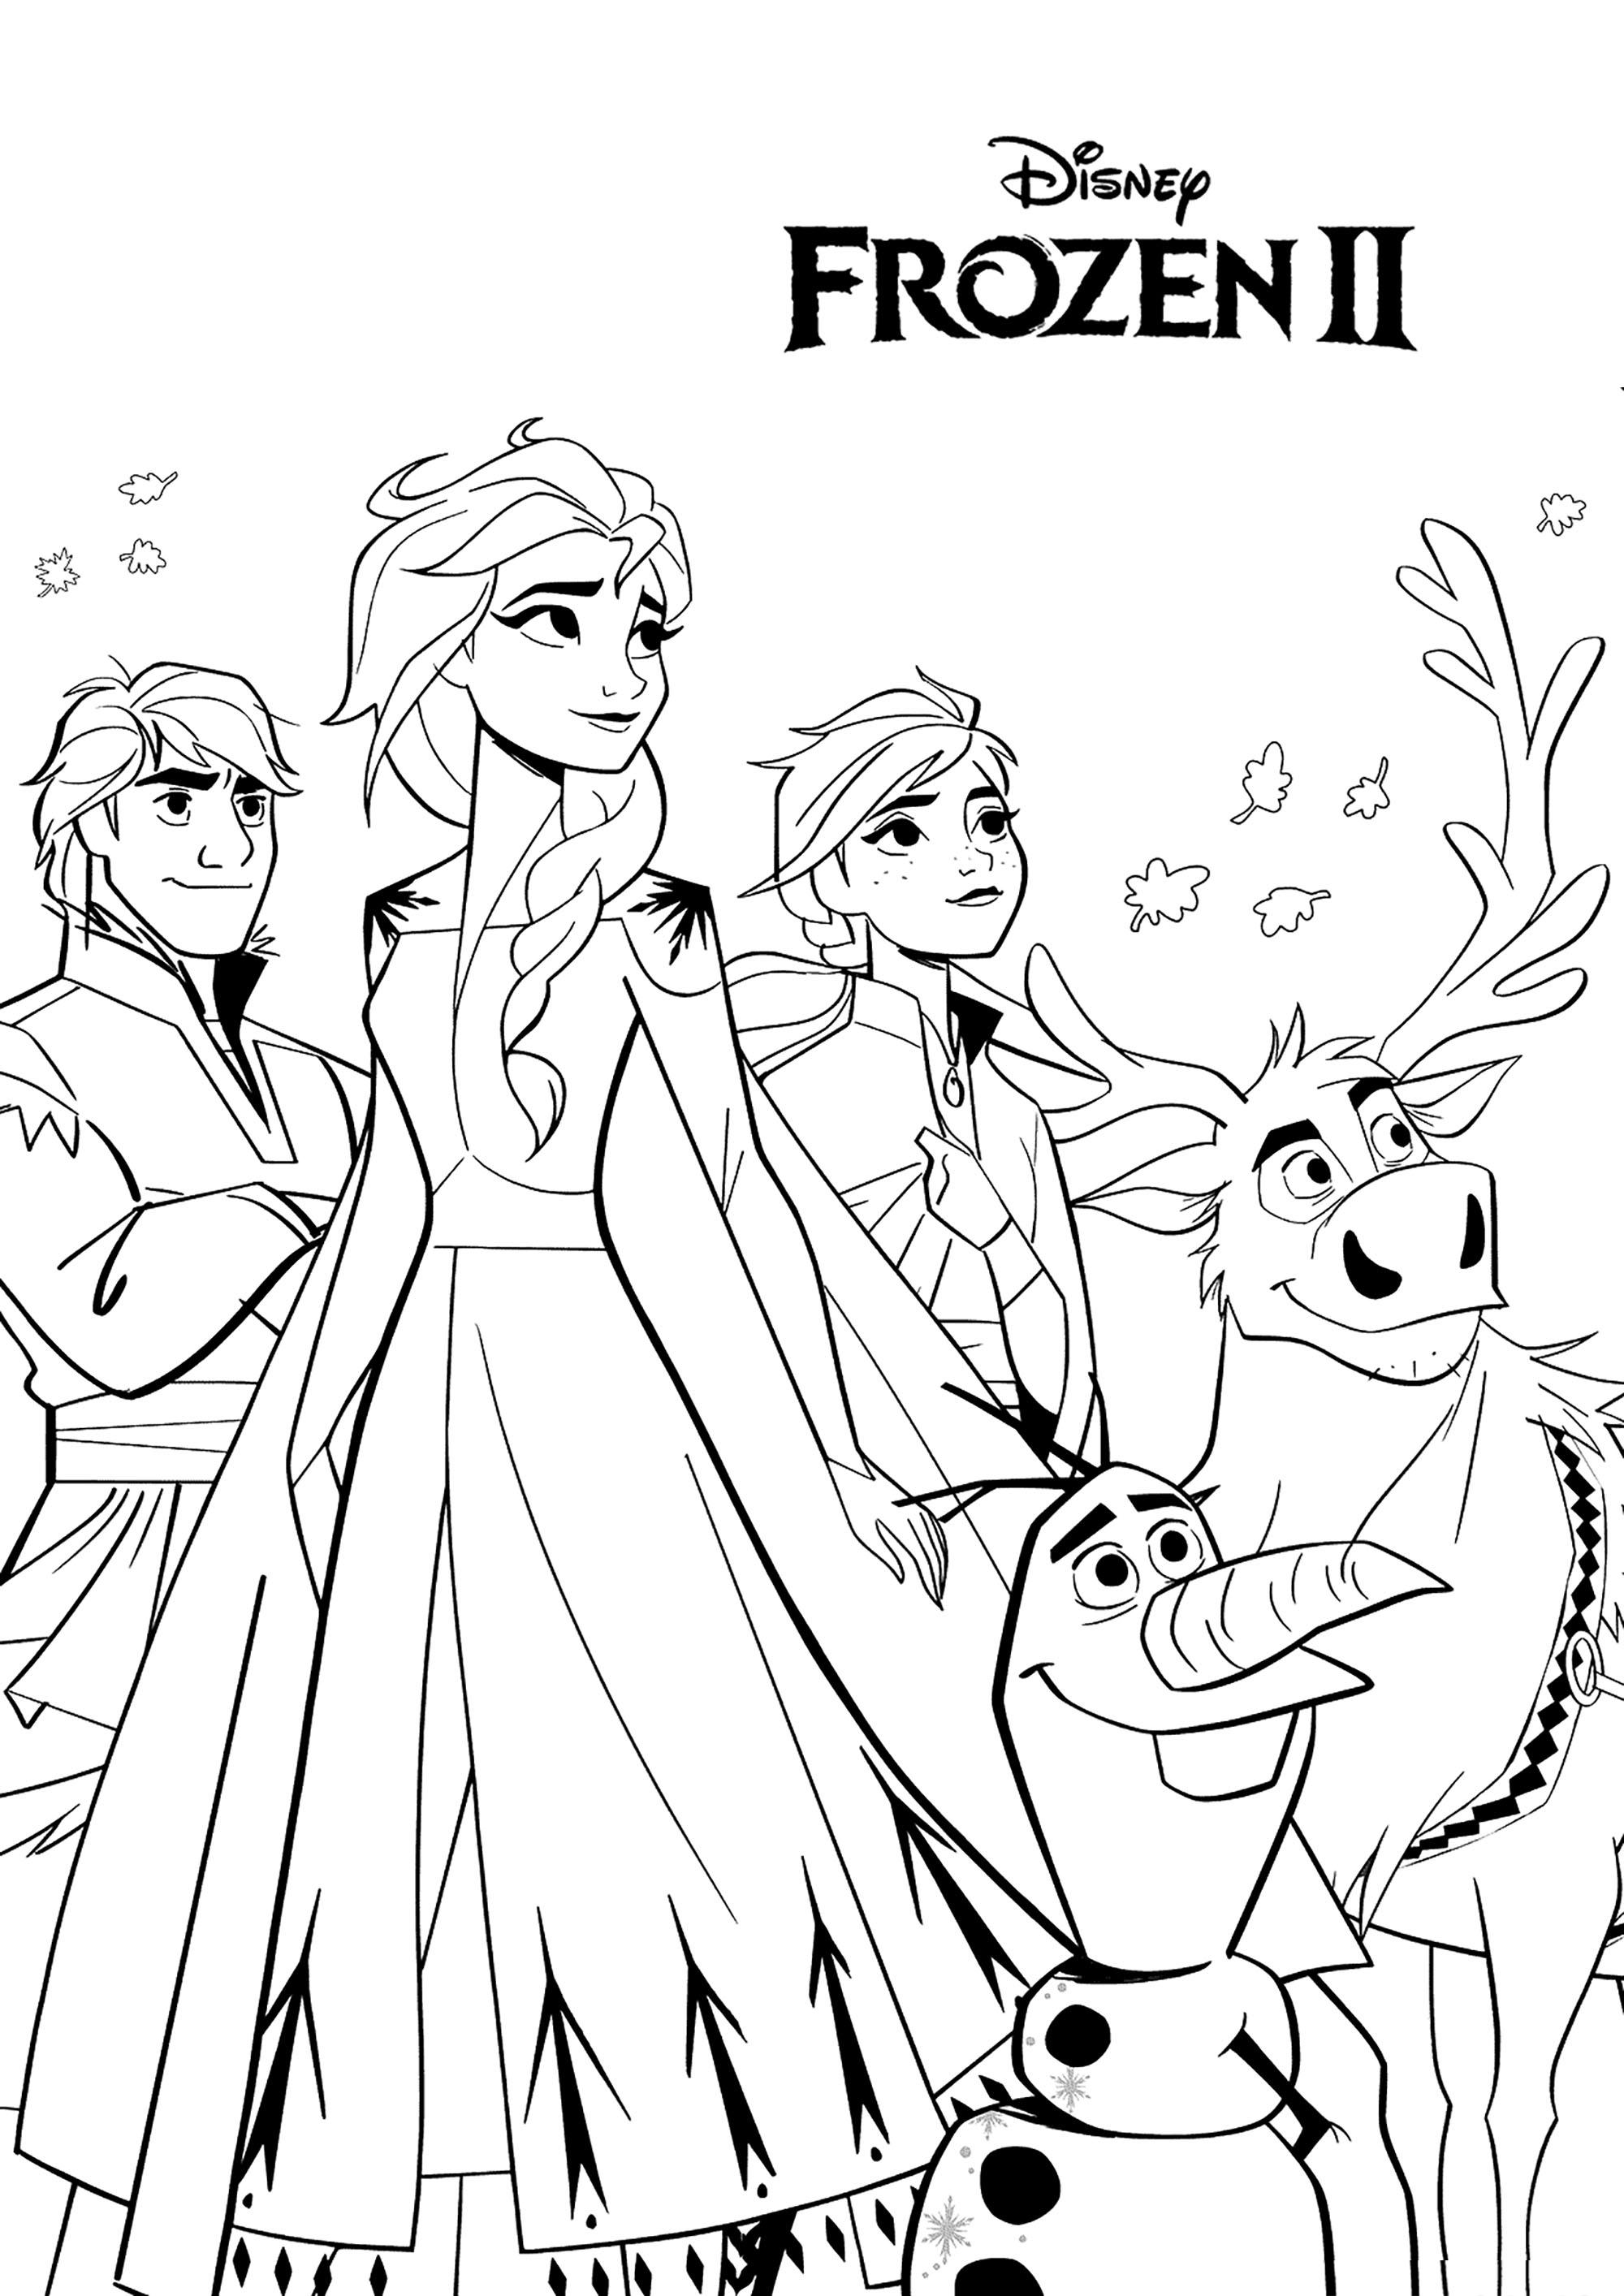 Frozen 2 To Print